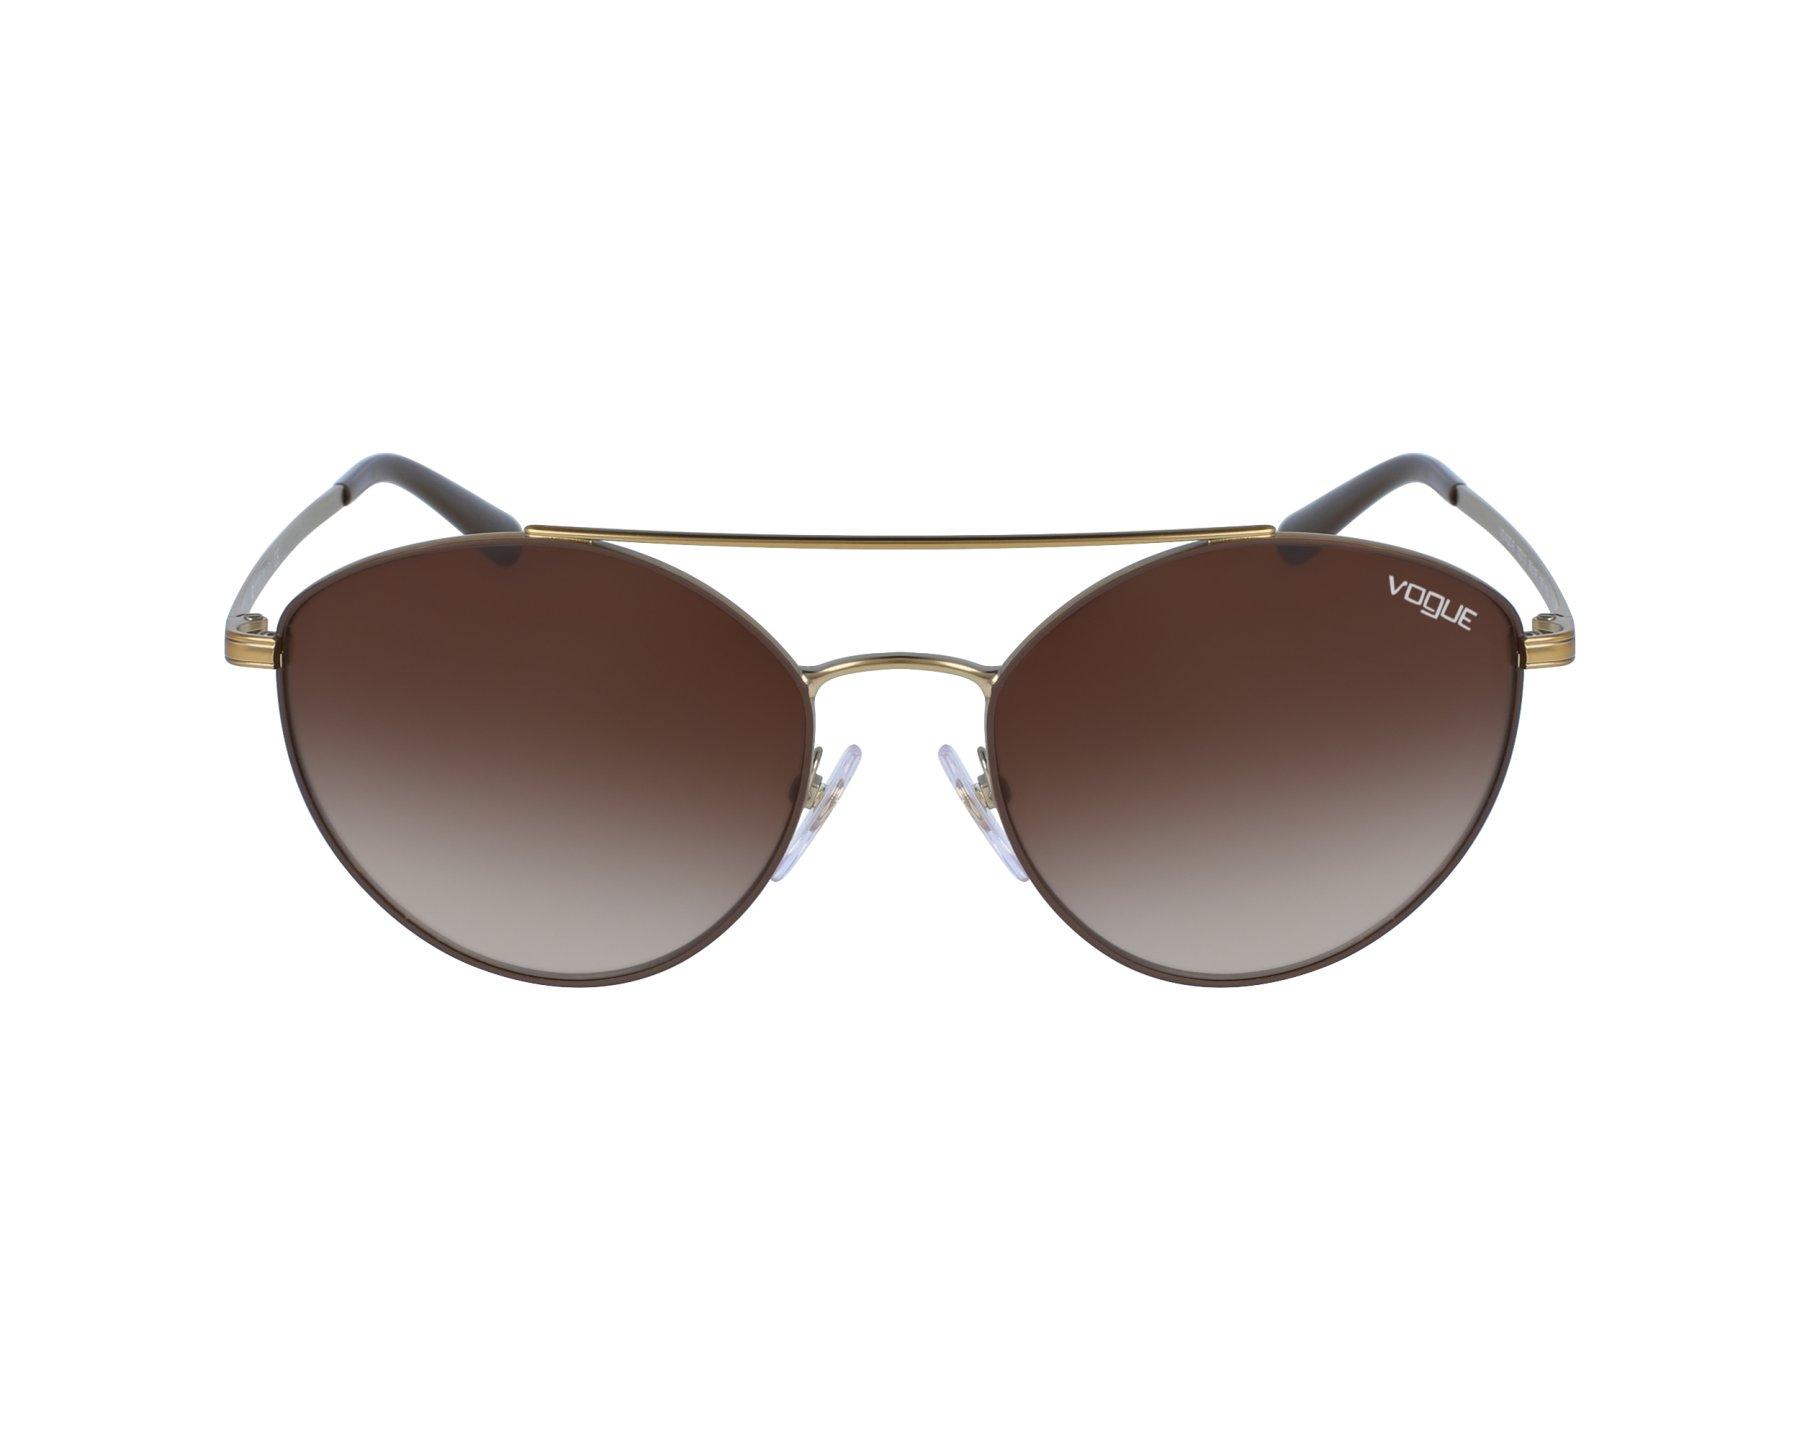 Vogue Eyewear VO 4023-S 50245R , Doré , Aviator